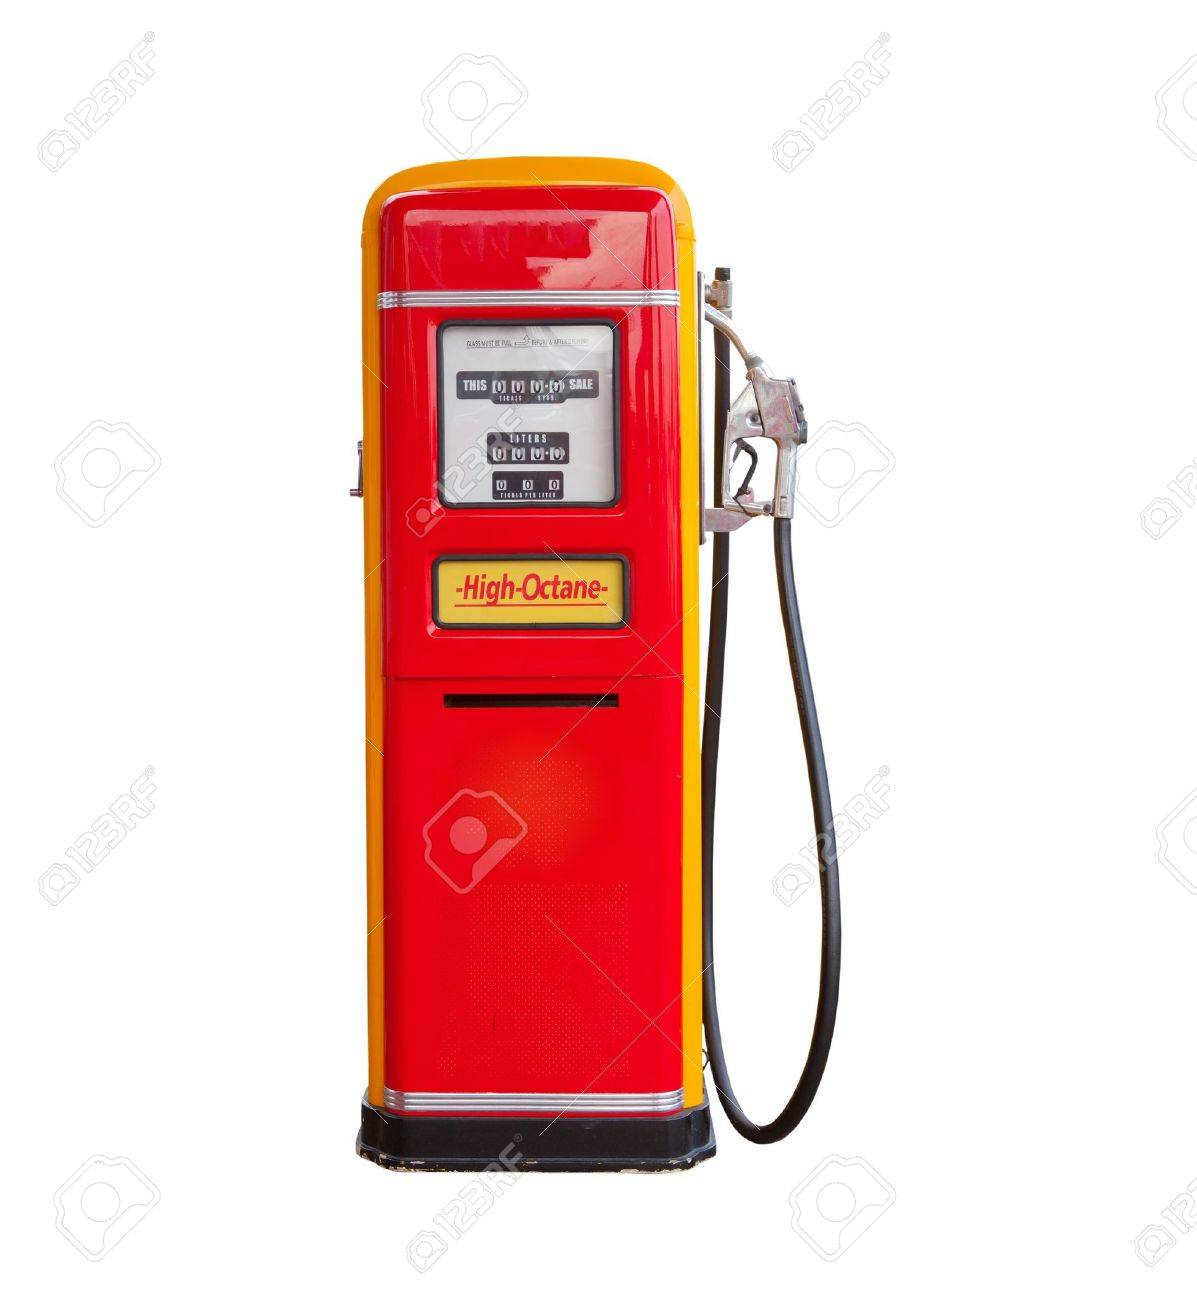 red vintage gasoline pump over white background - 16053689